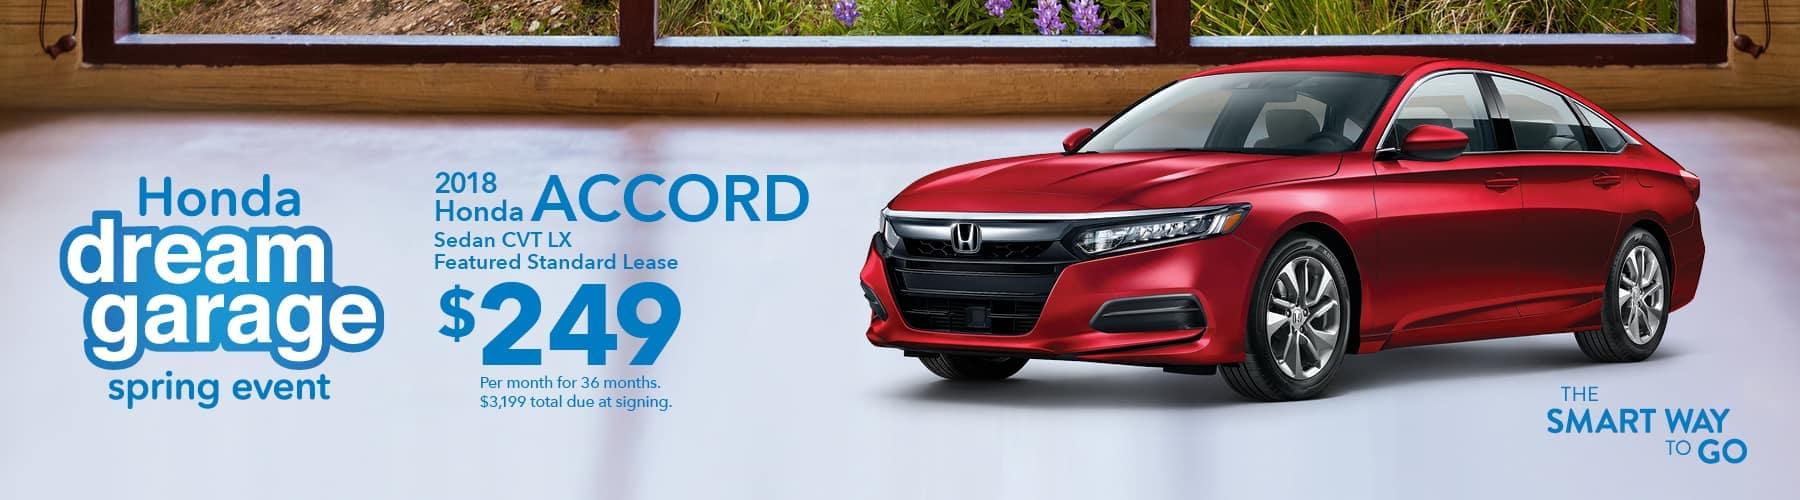 Tri-State Honda Dream Garage Spring Event 2018 Accord Lease Offer